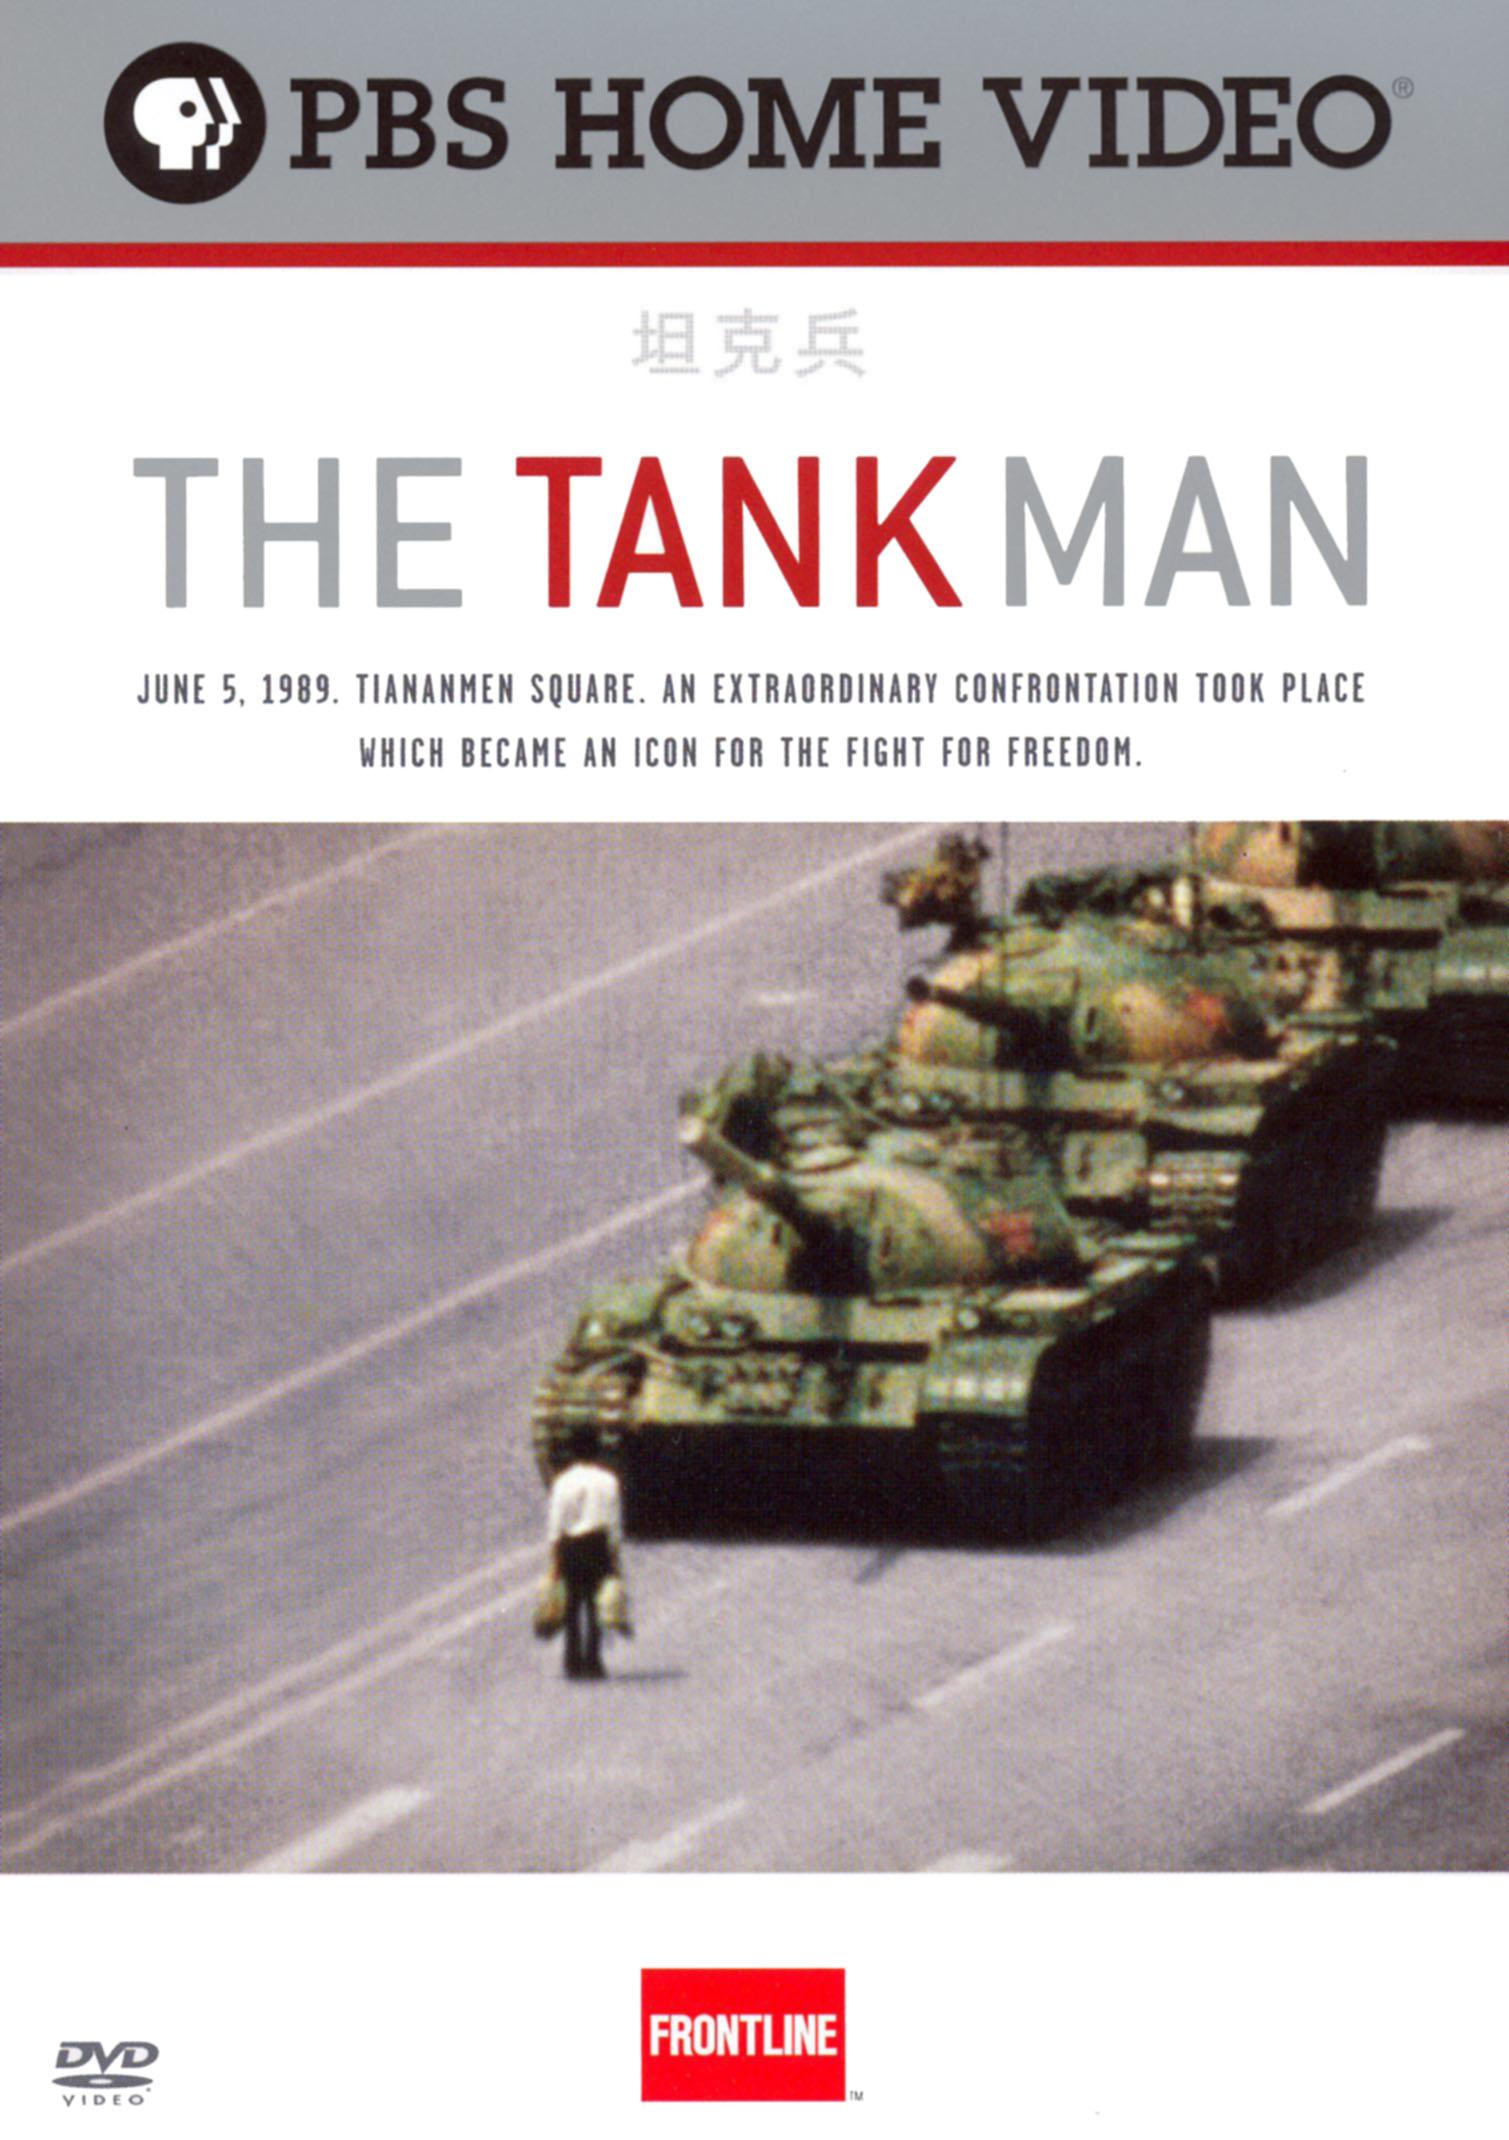 Frontline: The Tank Man